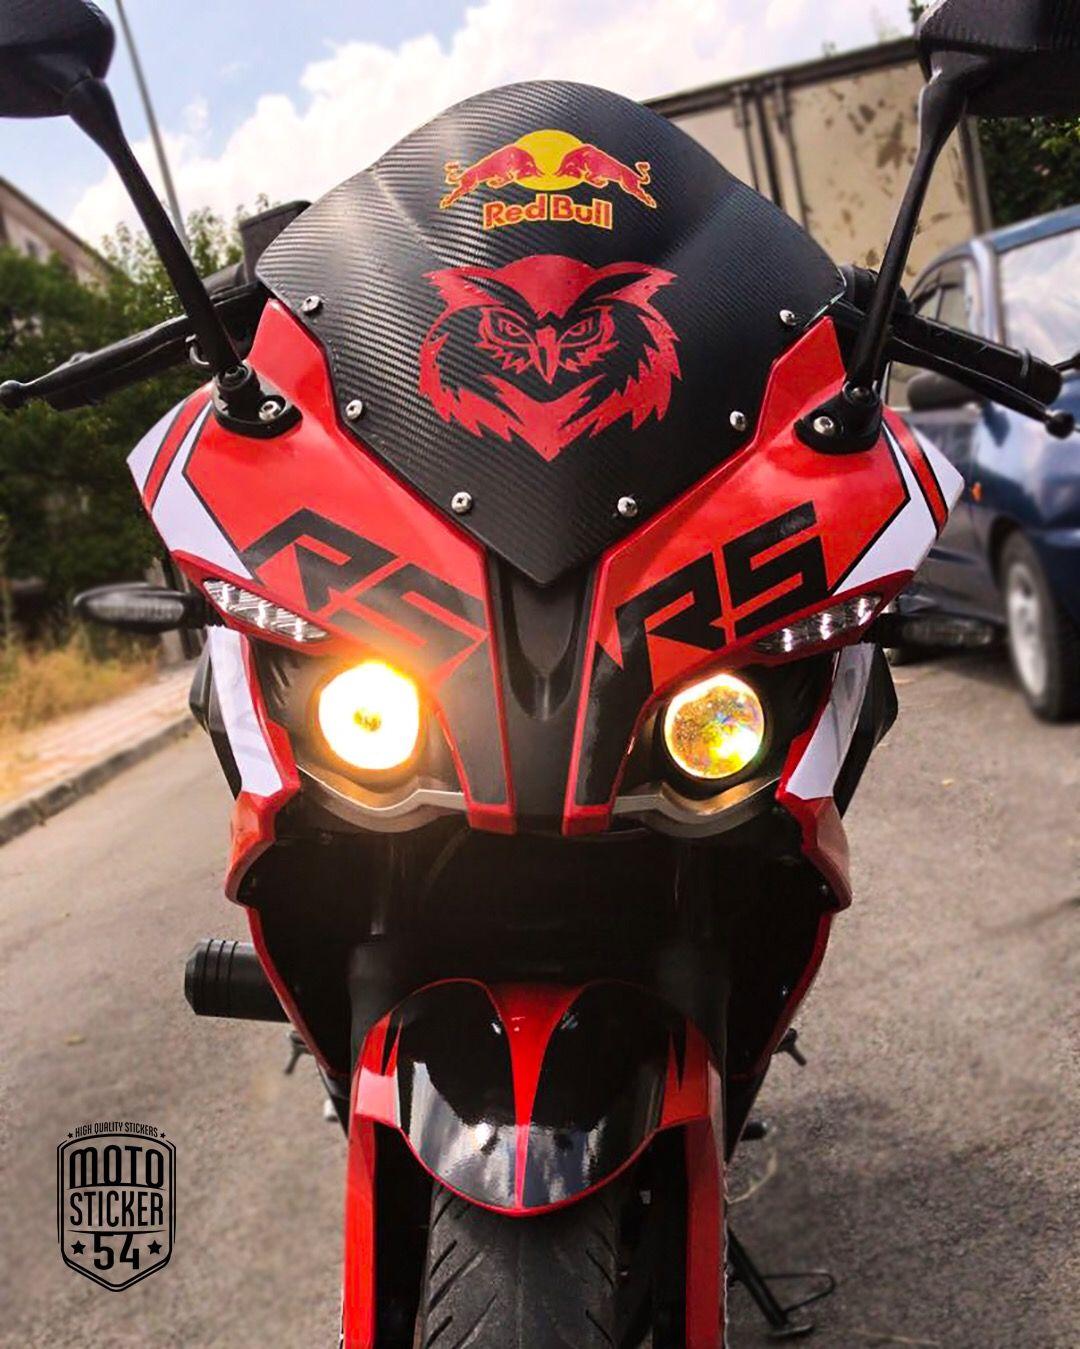 Bajaj pulsar rs200 special design red sticker kit motosticker54 motorcycle bajaj pulsar sticker wrap racingbike